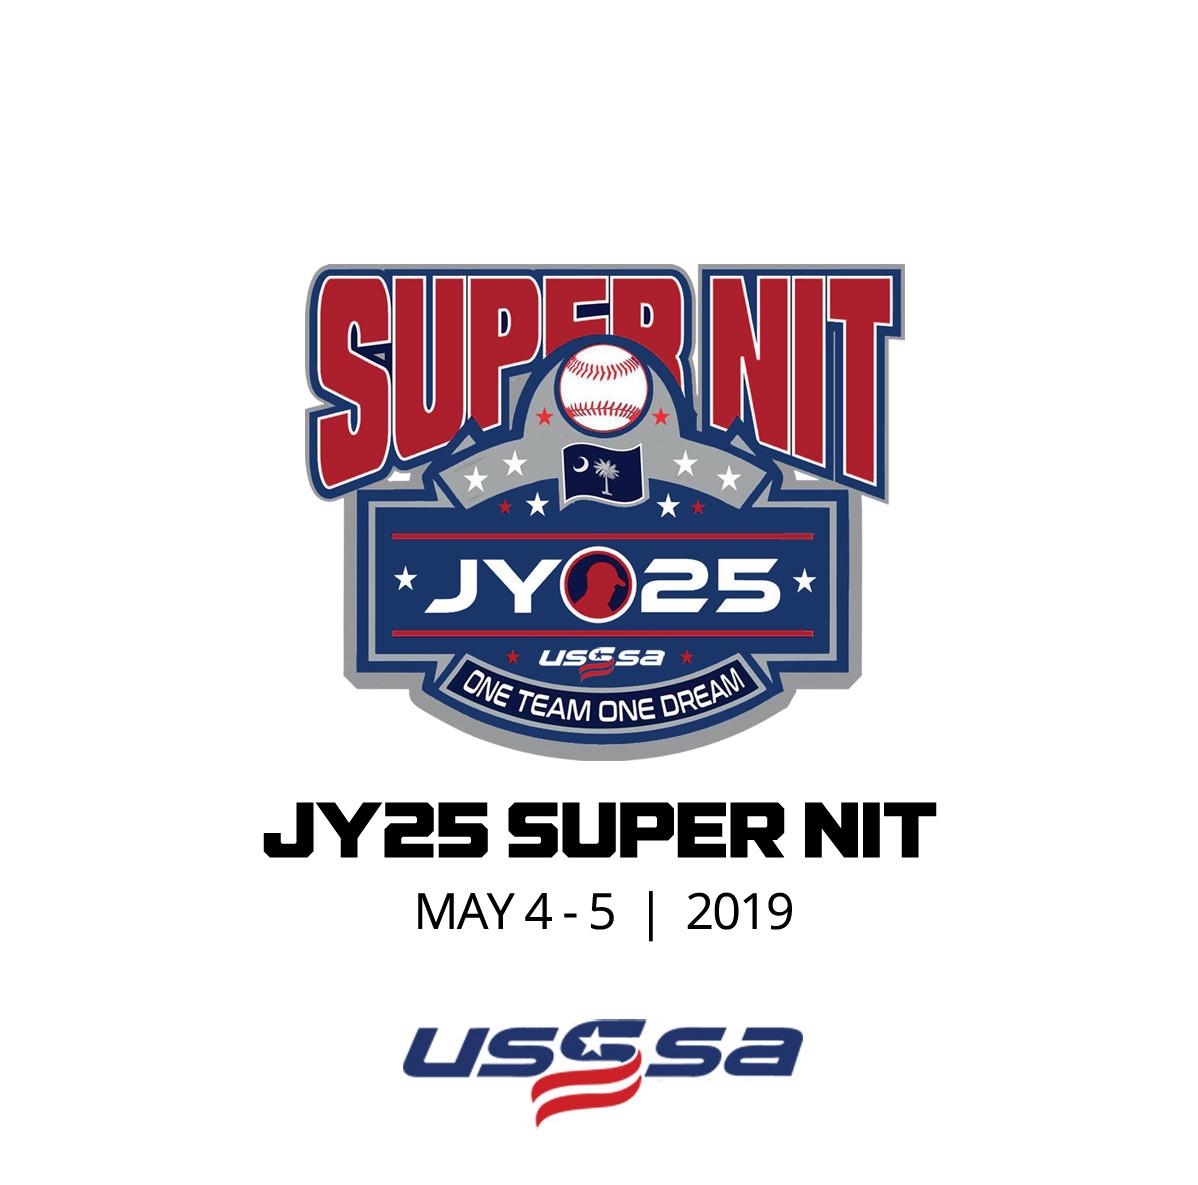 UPSTATE - JY25 SUPER NIT